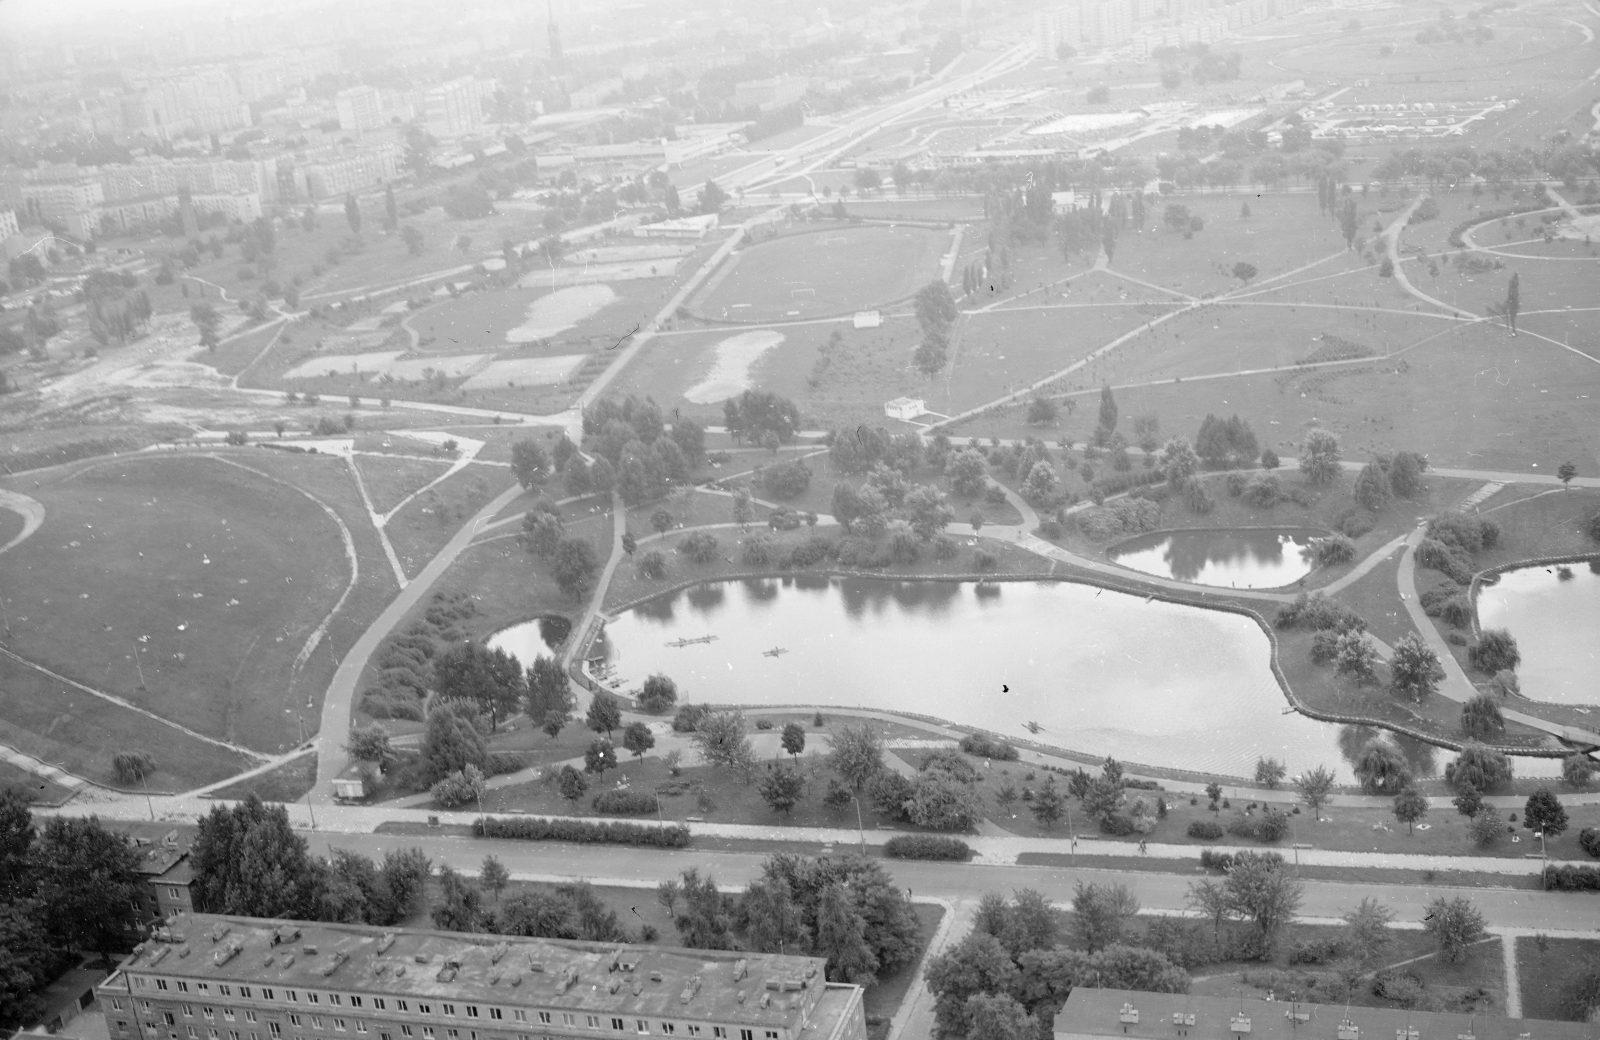 Moczydło Park aerial view, Lech Zielaskowski's photo archives, 1975, NAC, file no. 3/53/0/8/564